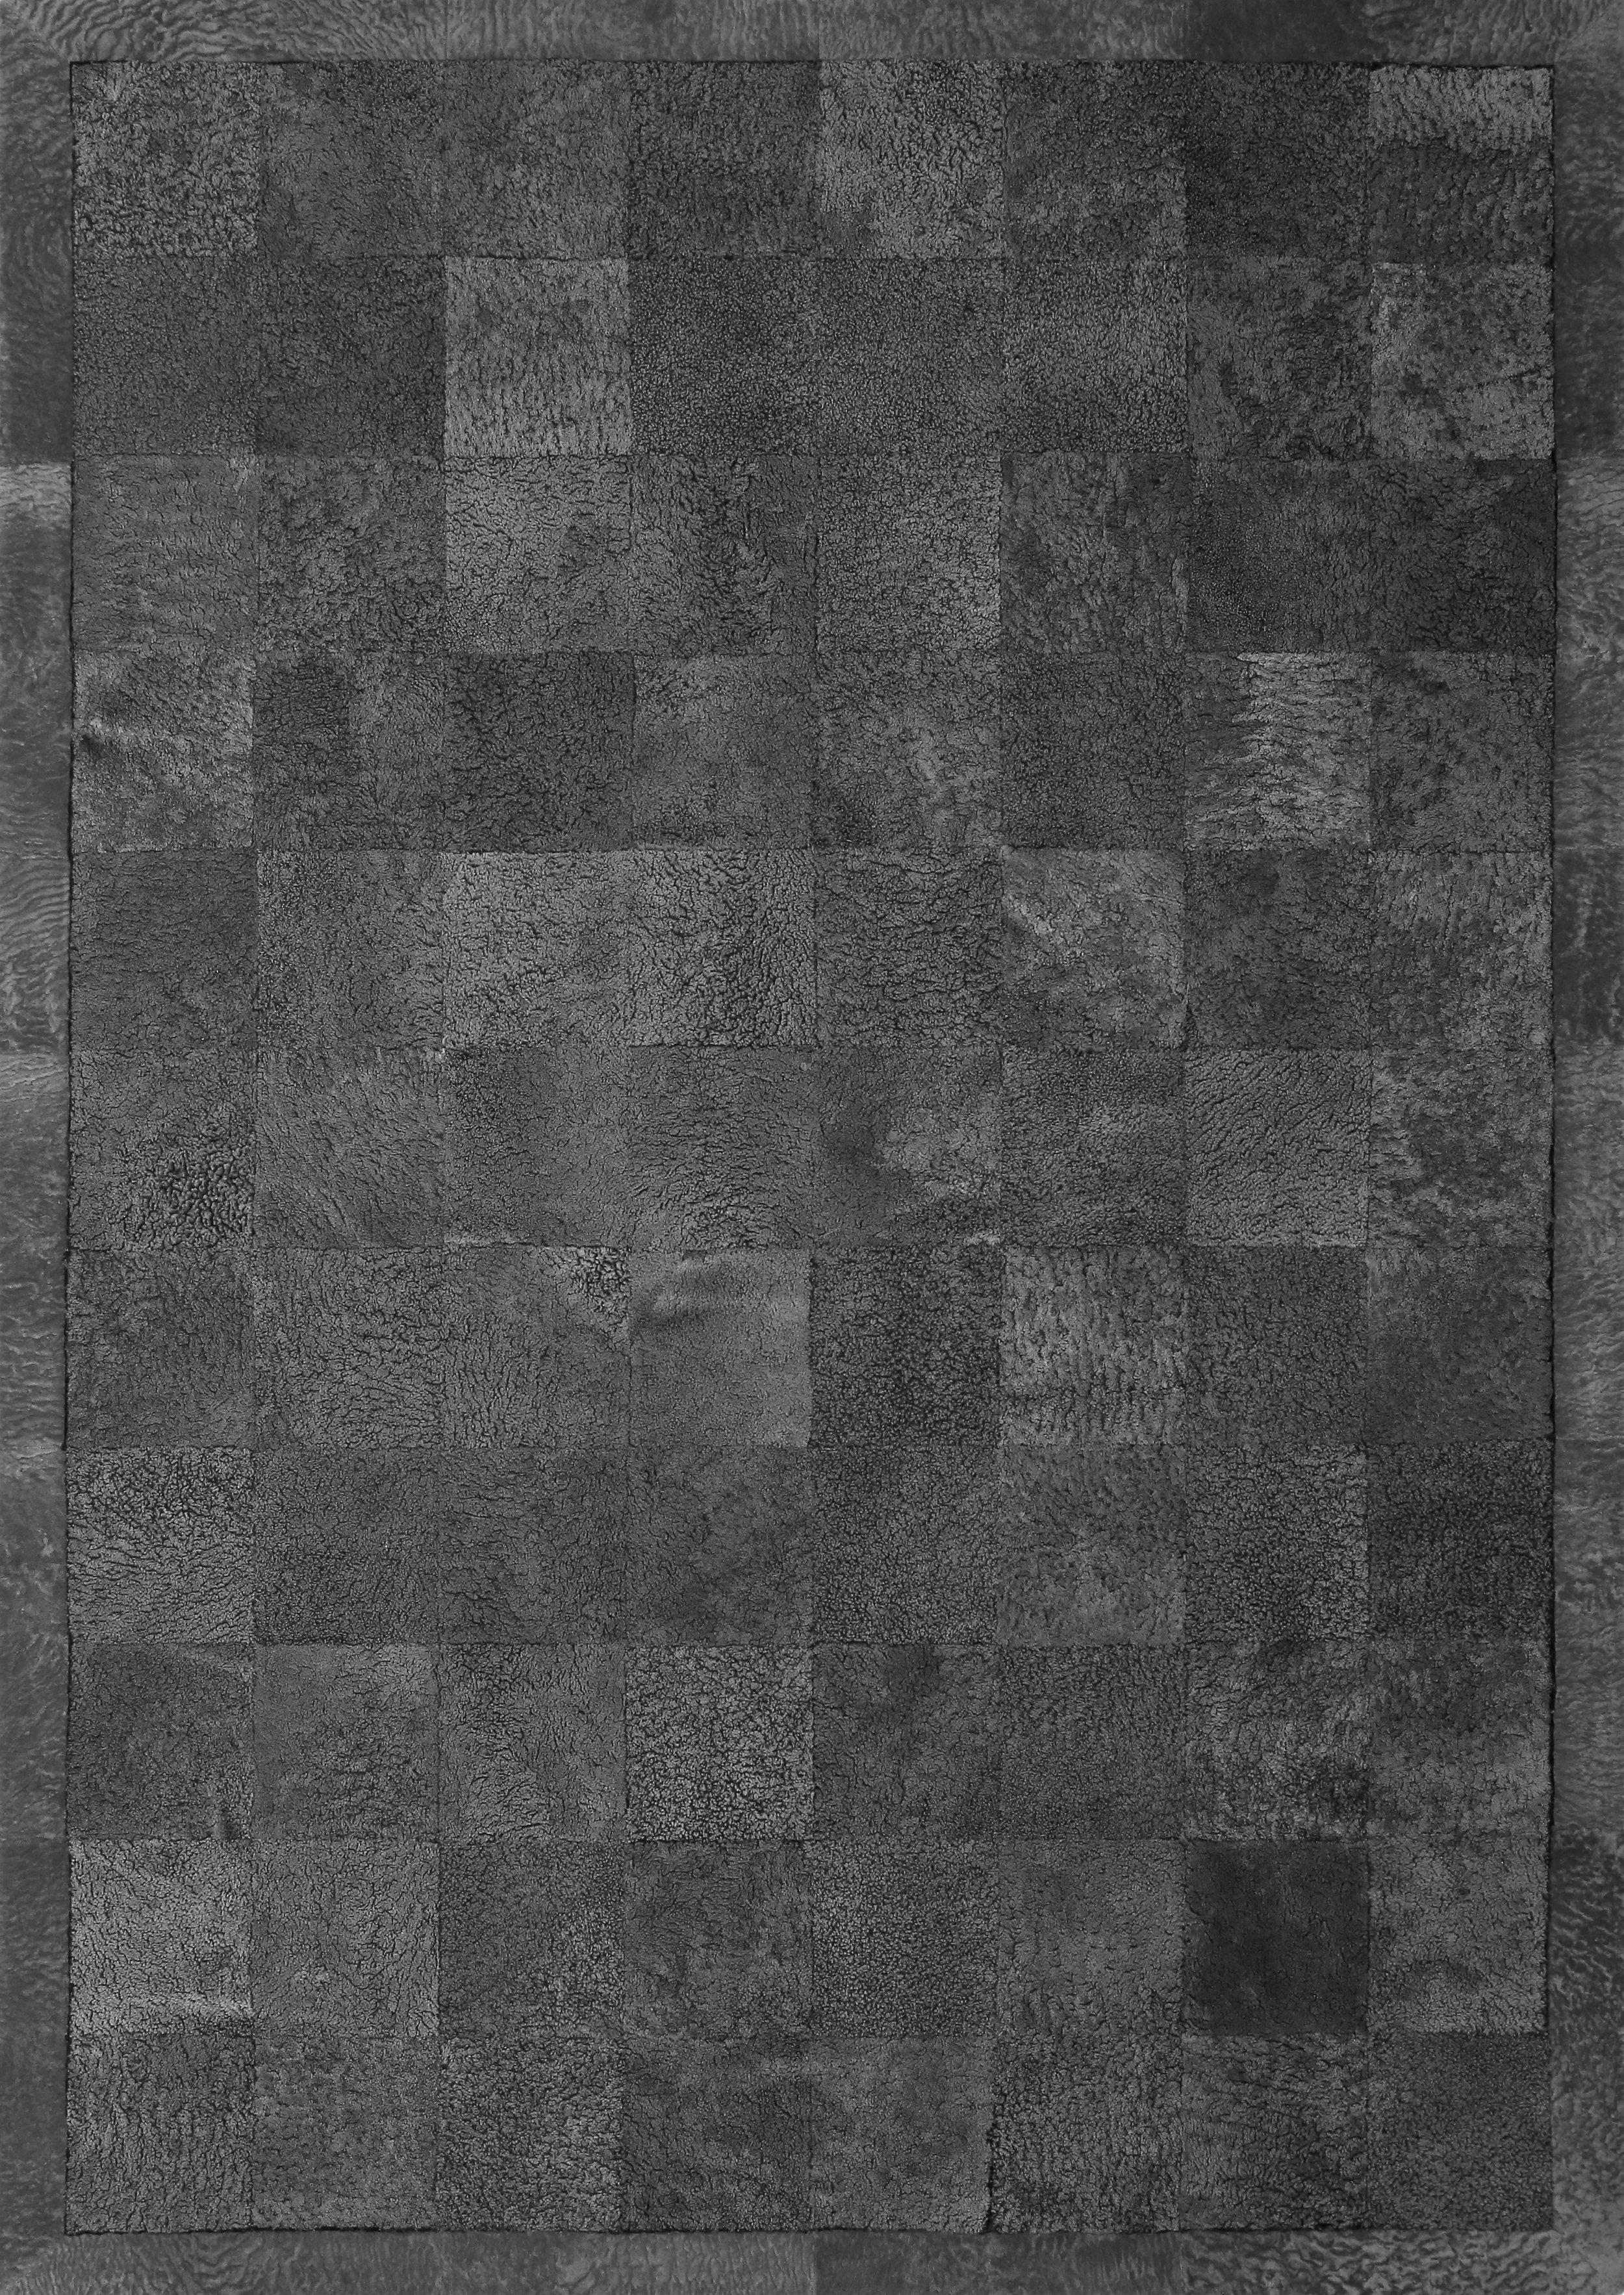 LARA 'JUNGLE' (J 46 - AST 40) (5).jpg